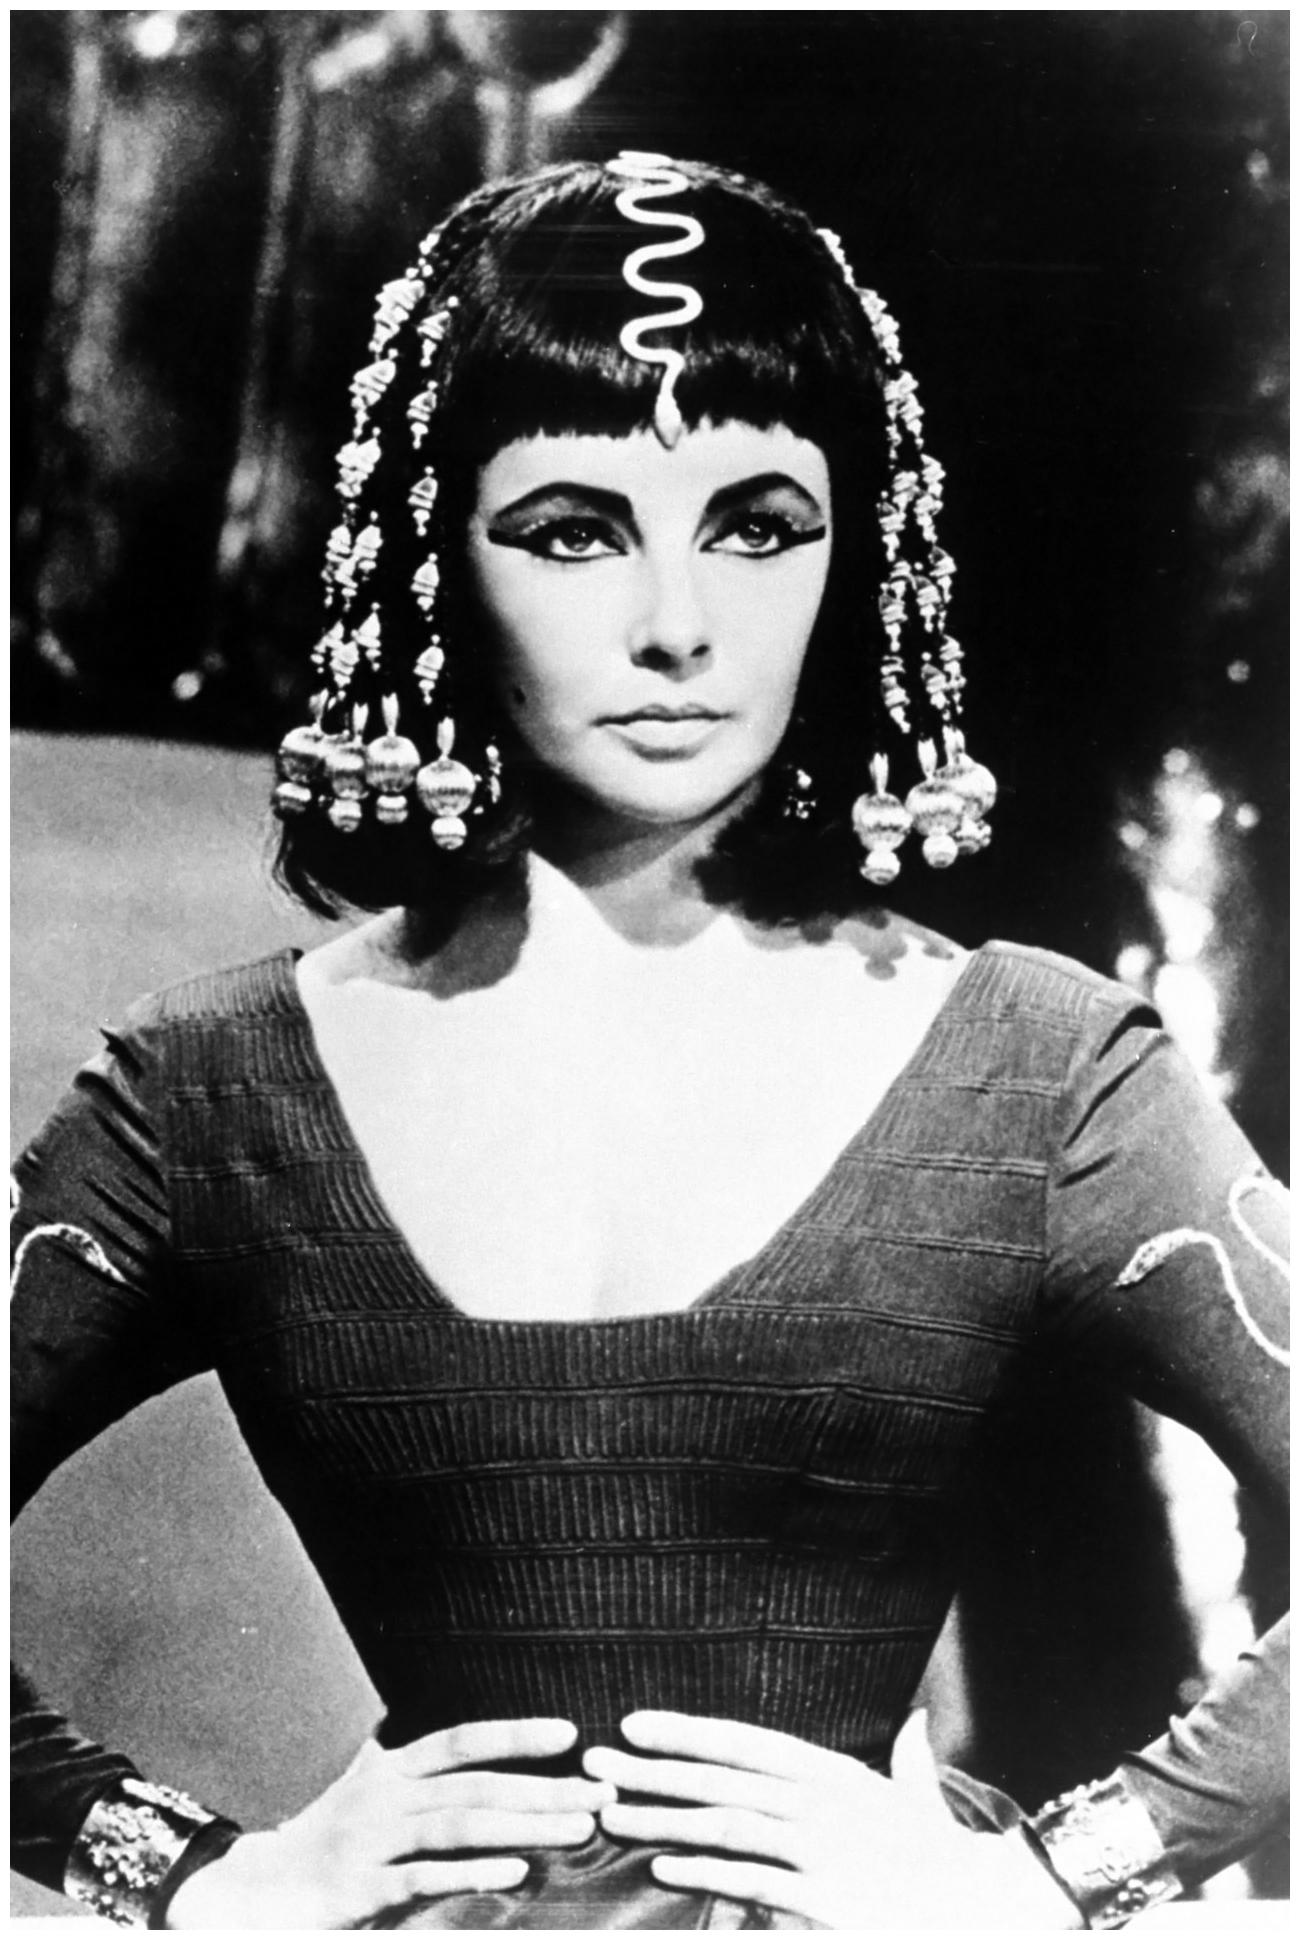 Cleopatra Elizabeth Taylor In The Film Cleopatra 1963